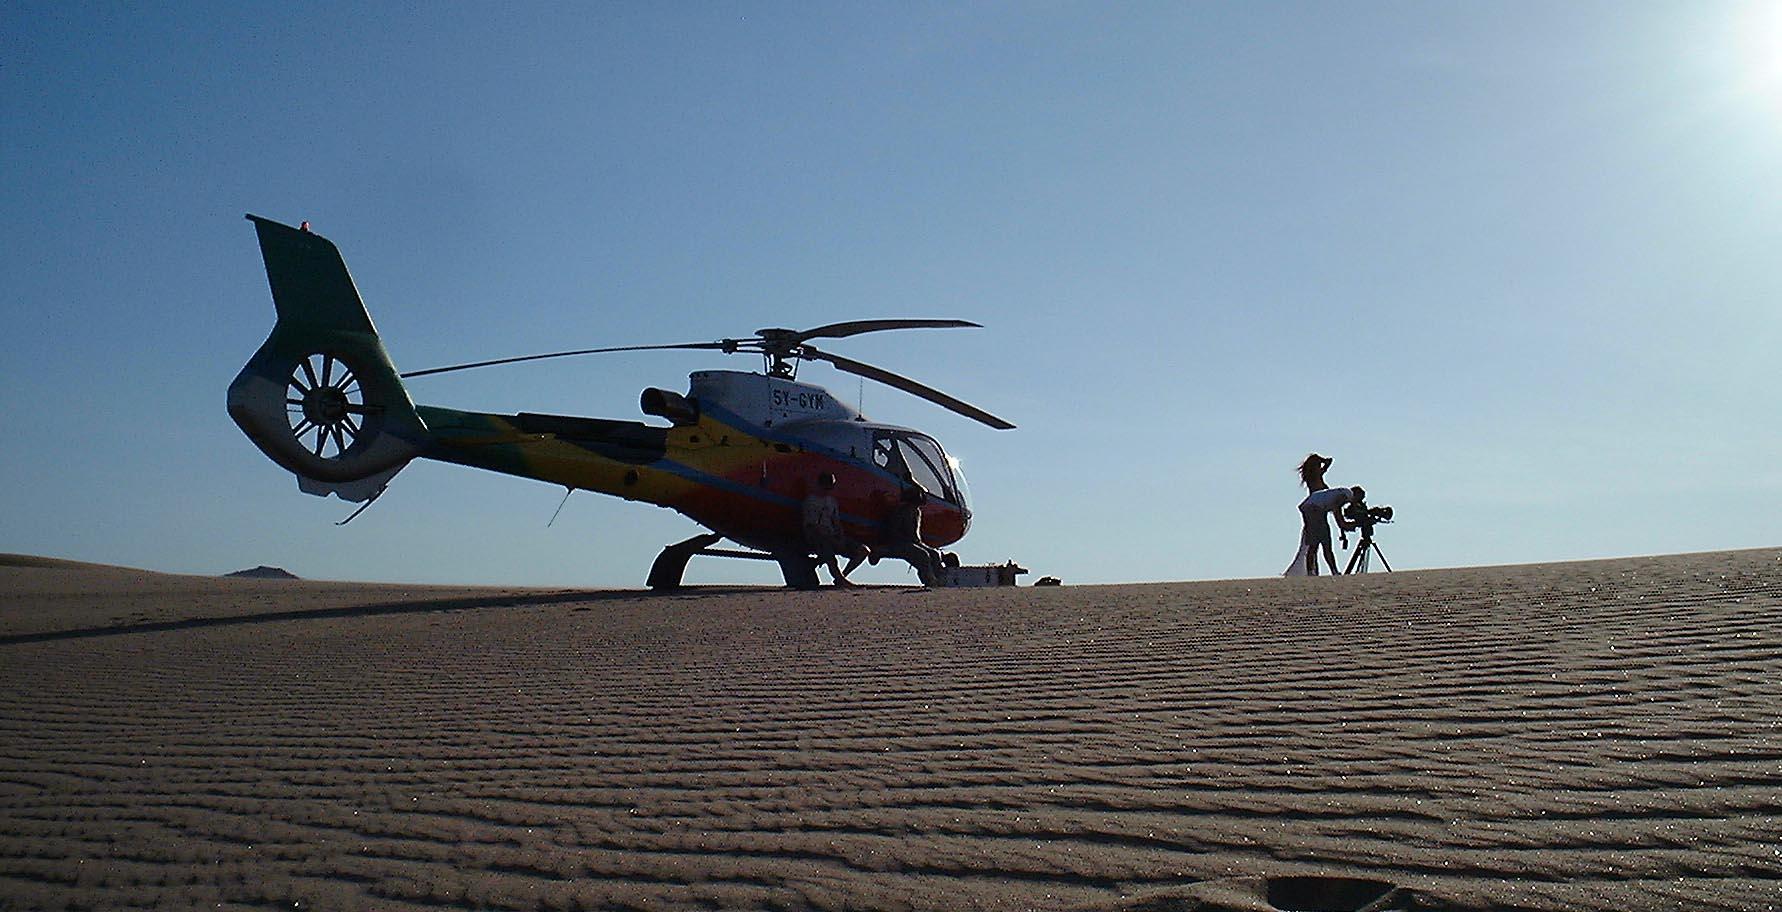 Safari Helicopter Tours Africa Exclusive Safaris